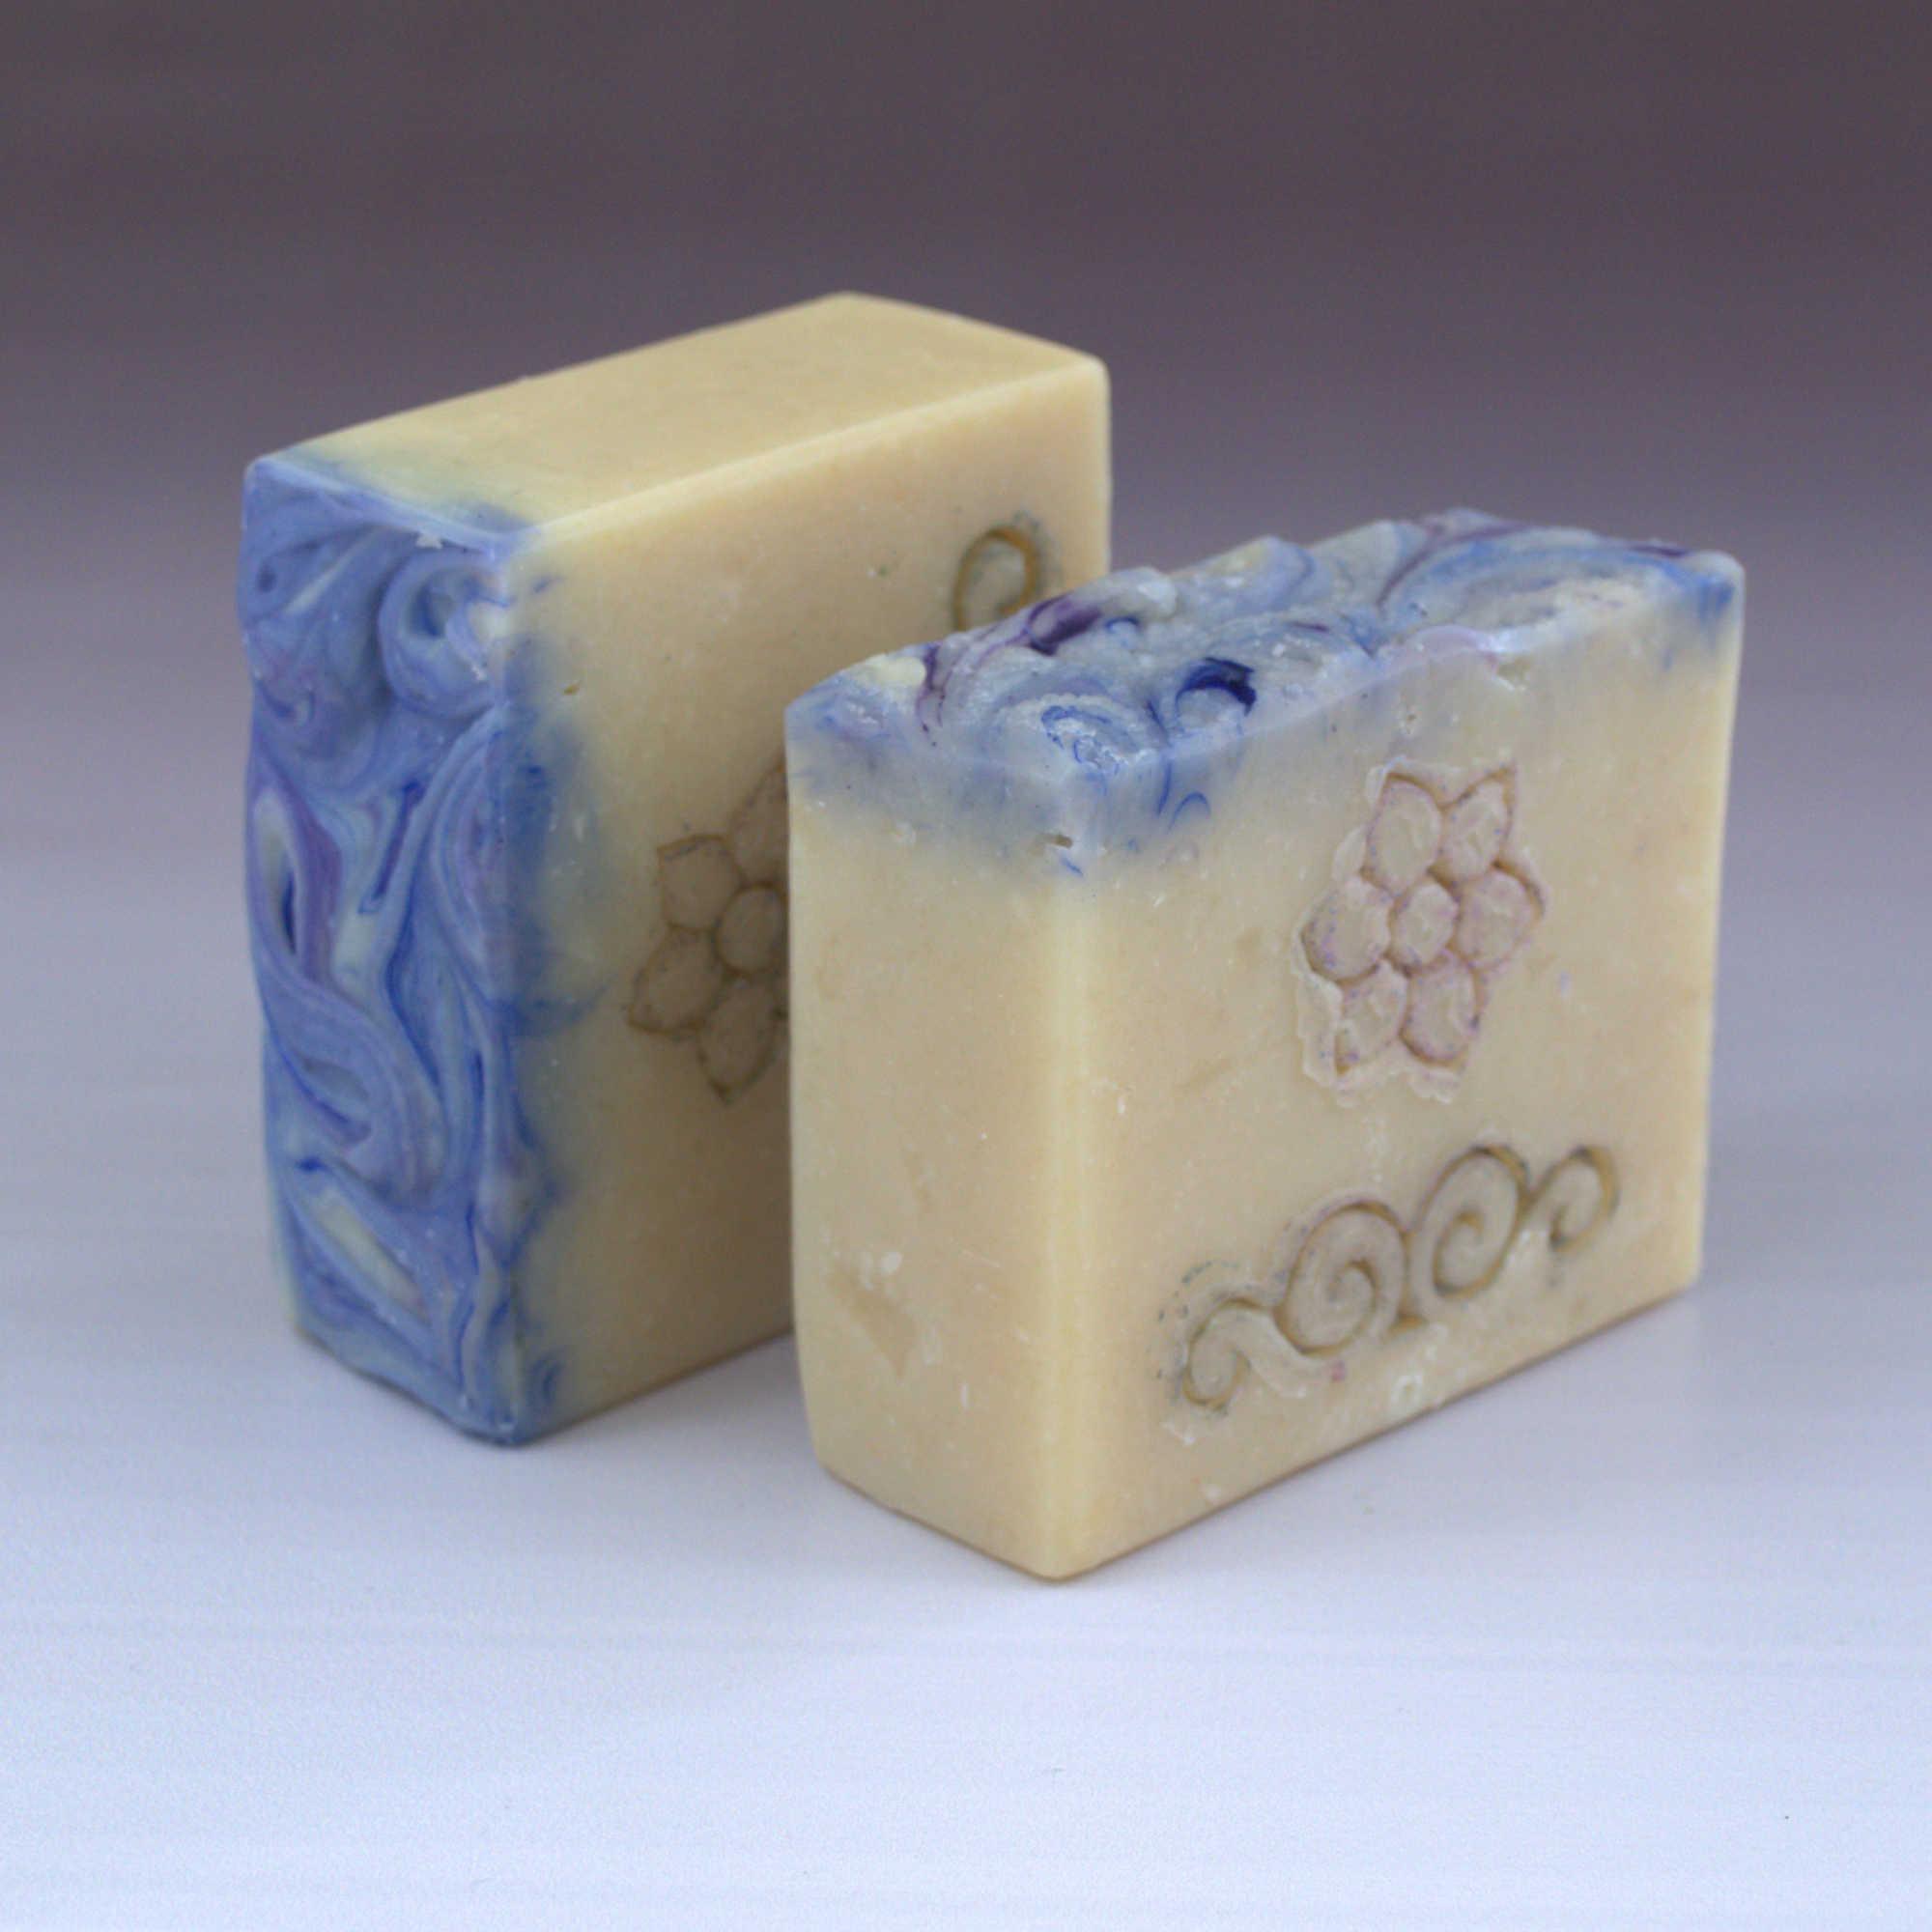 Violet & Birch Soap